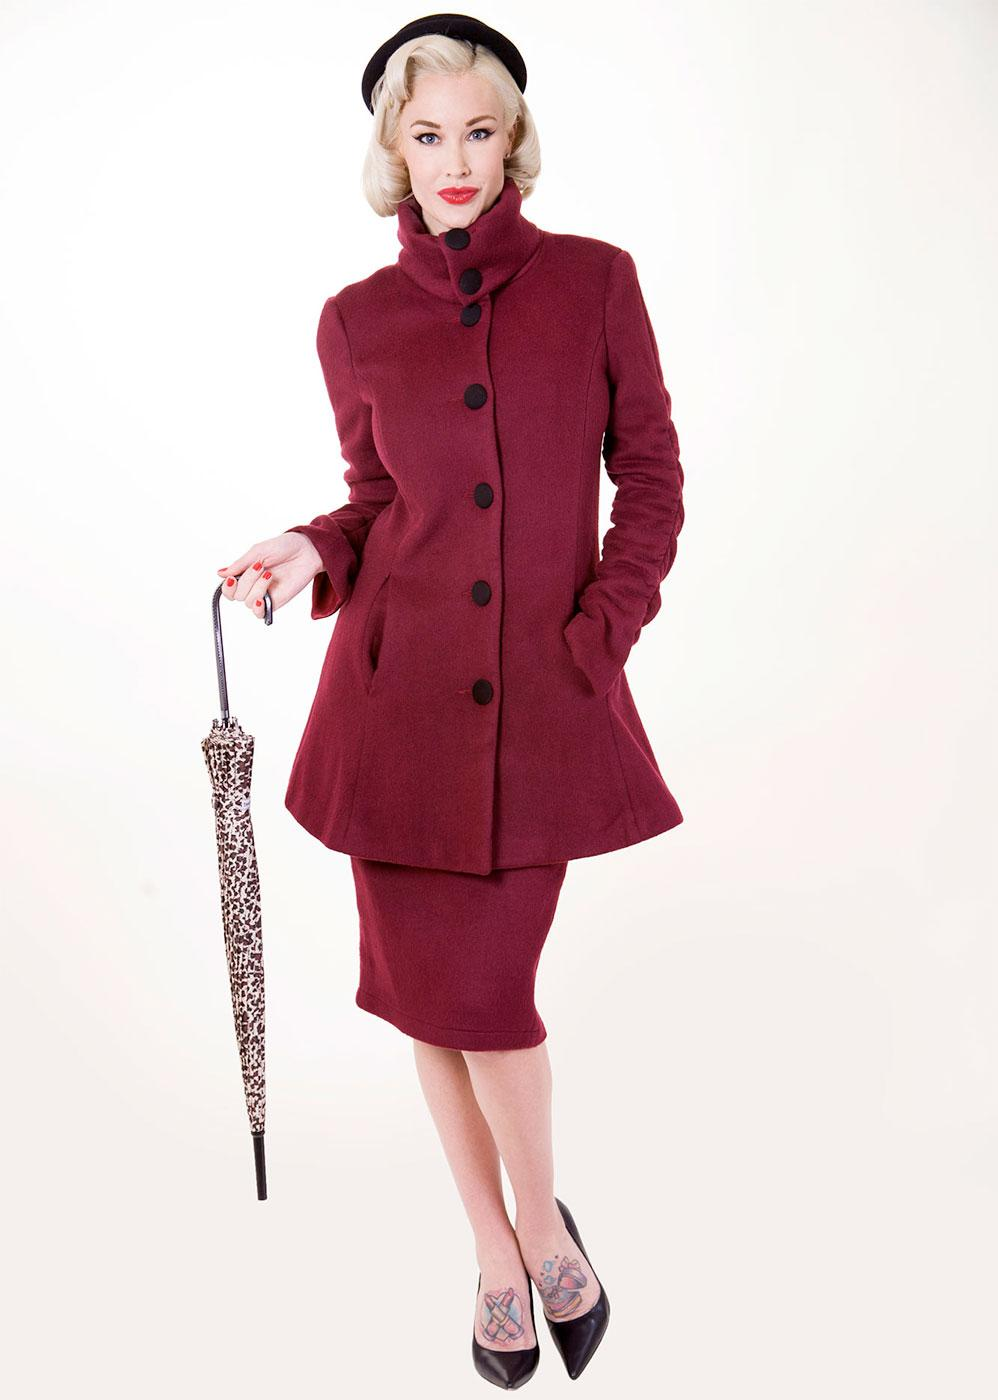 Divine TATYANA 1950s Vintage Matching Coat & Skirt